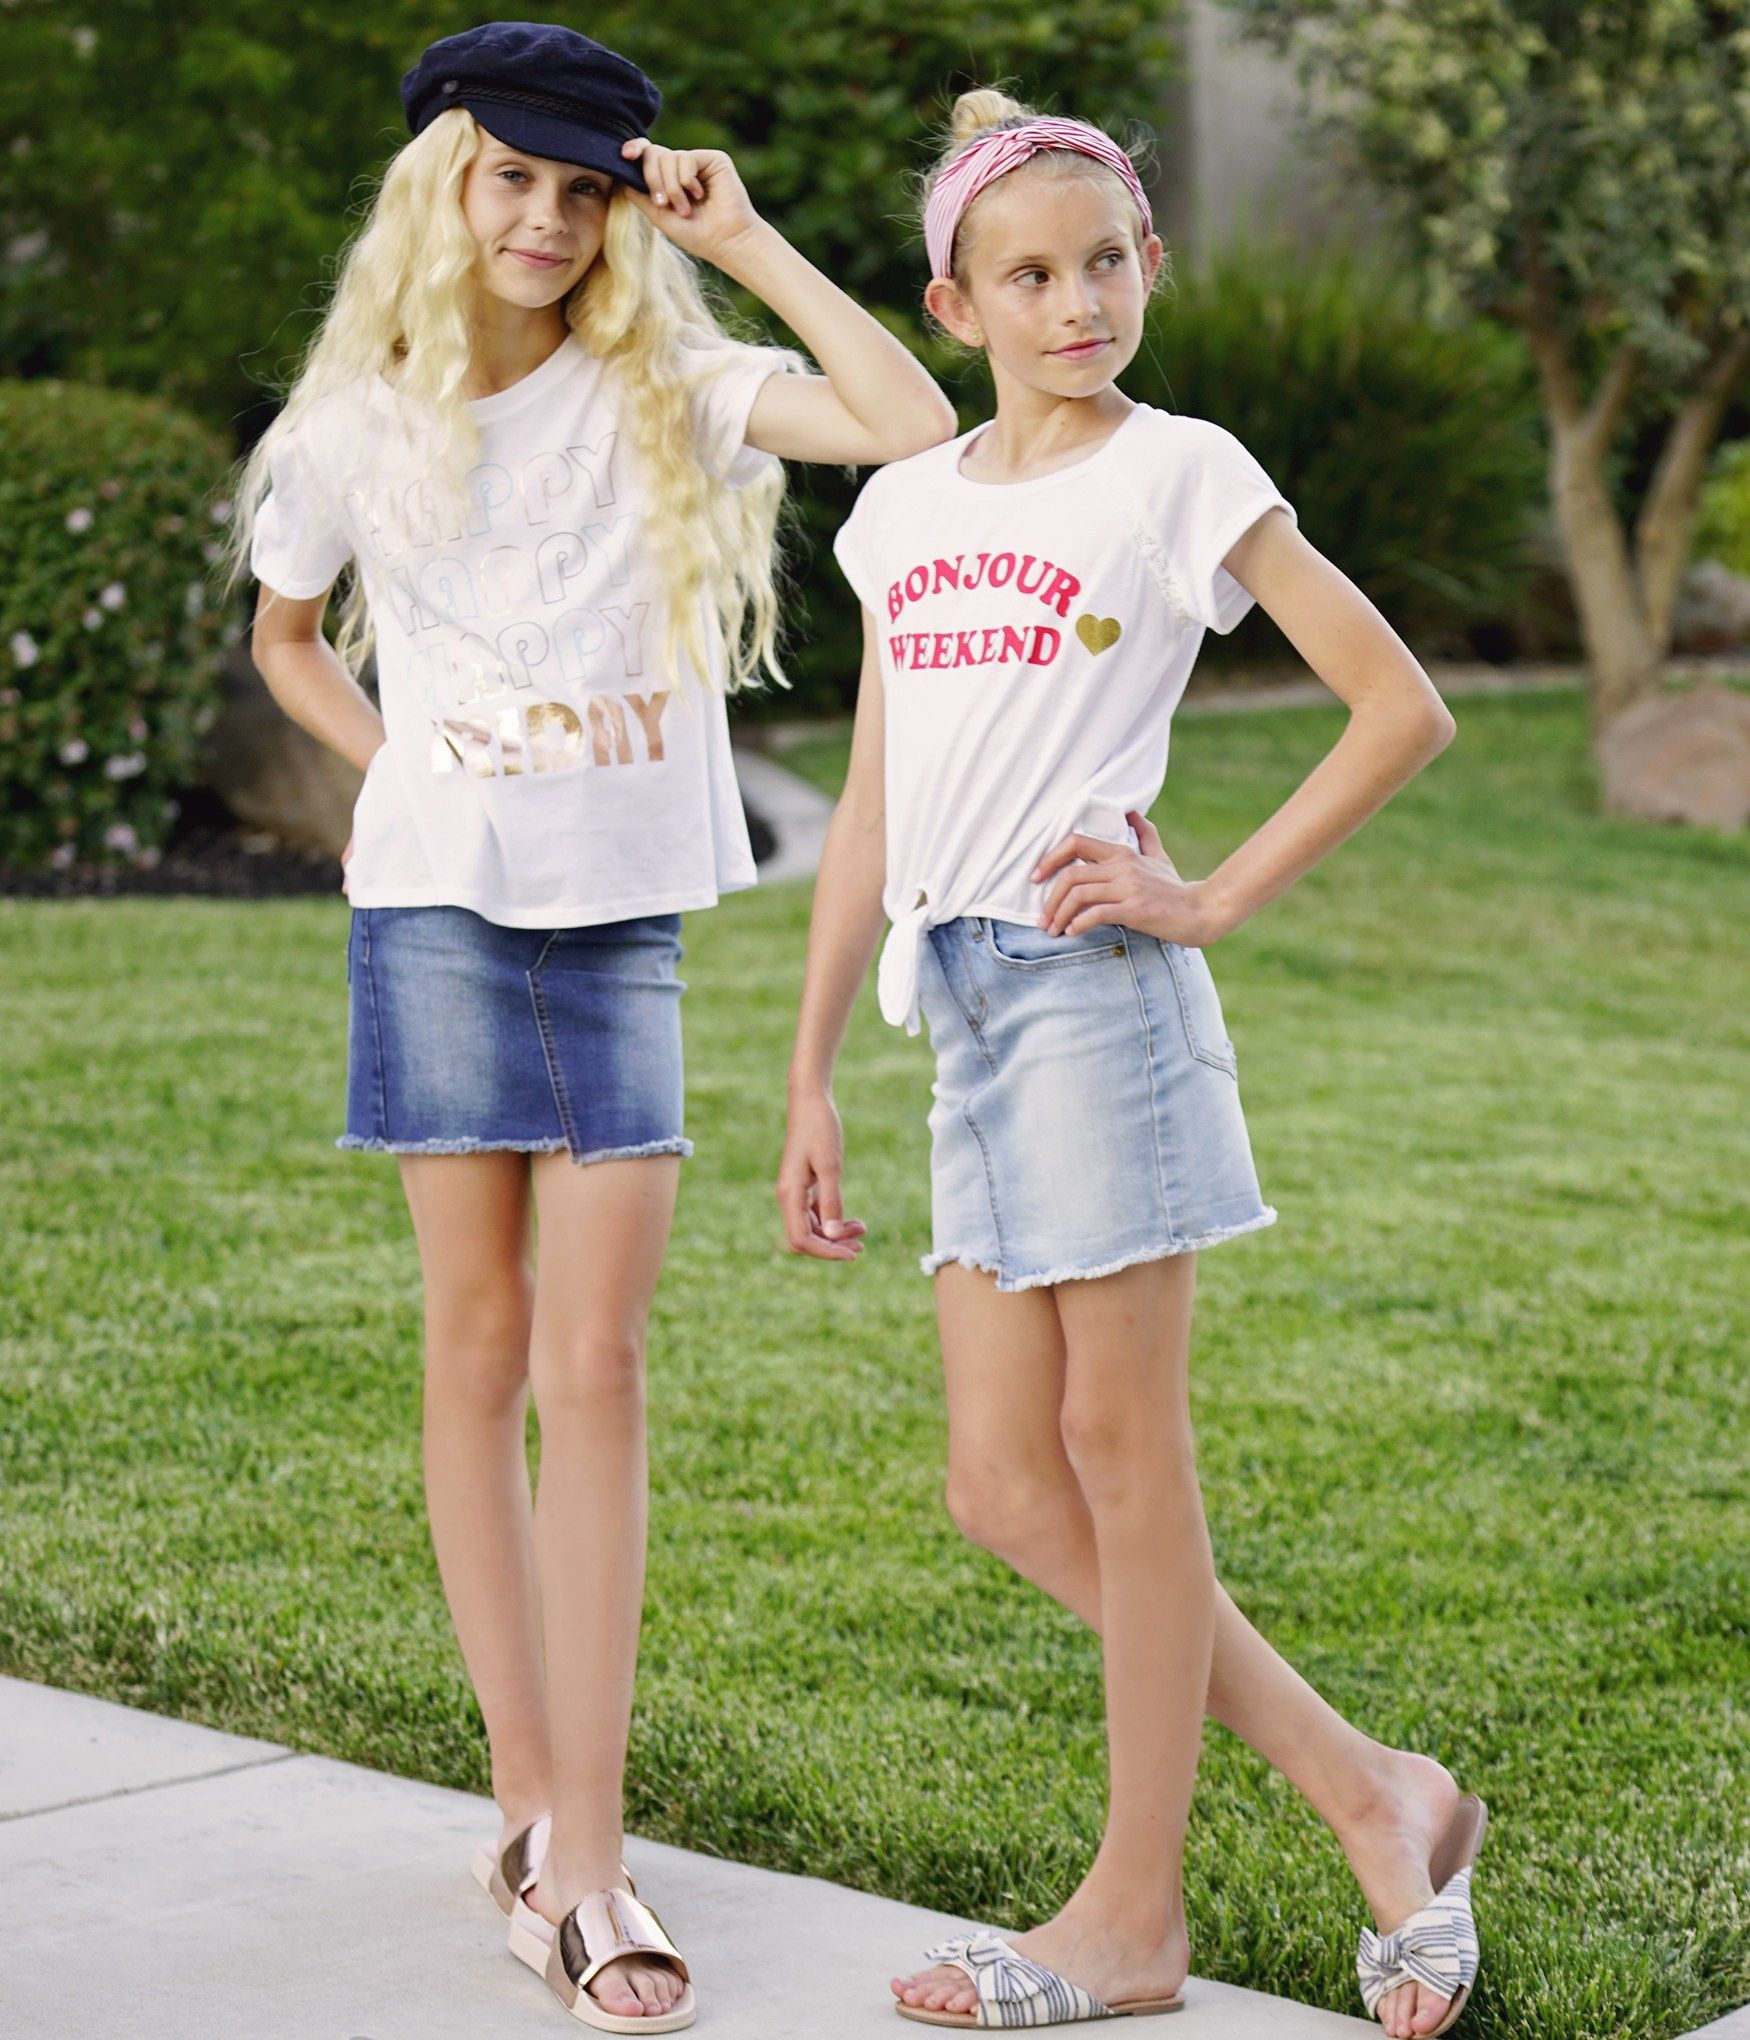 foto de Bonjour Weekend Summer outfits for teens Summer fashion